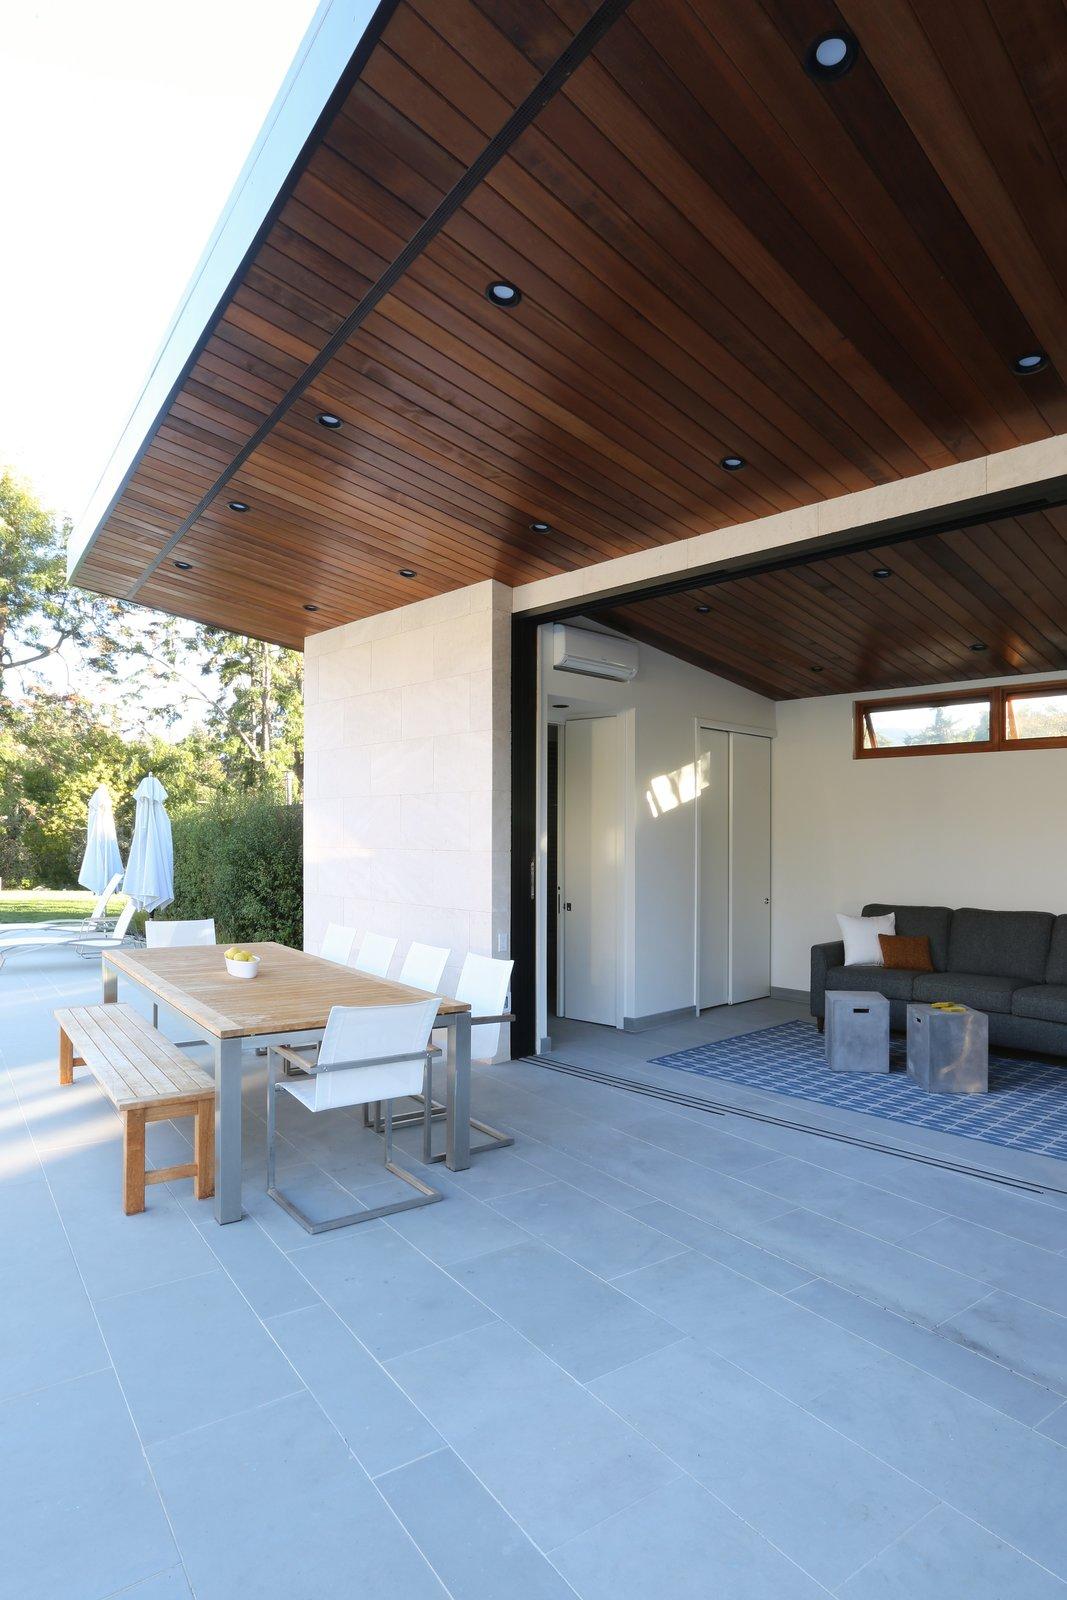 Cantilevered Roof Dining  Los Altos Hills Landscape by Greenblott Design